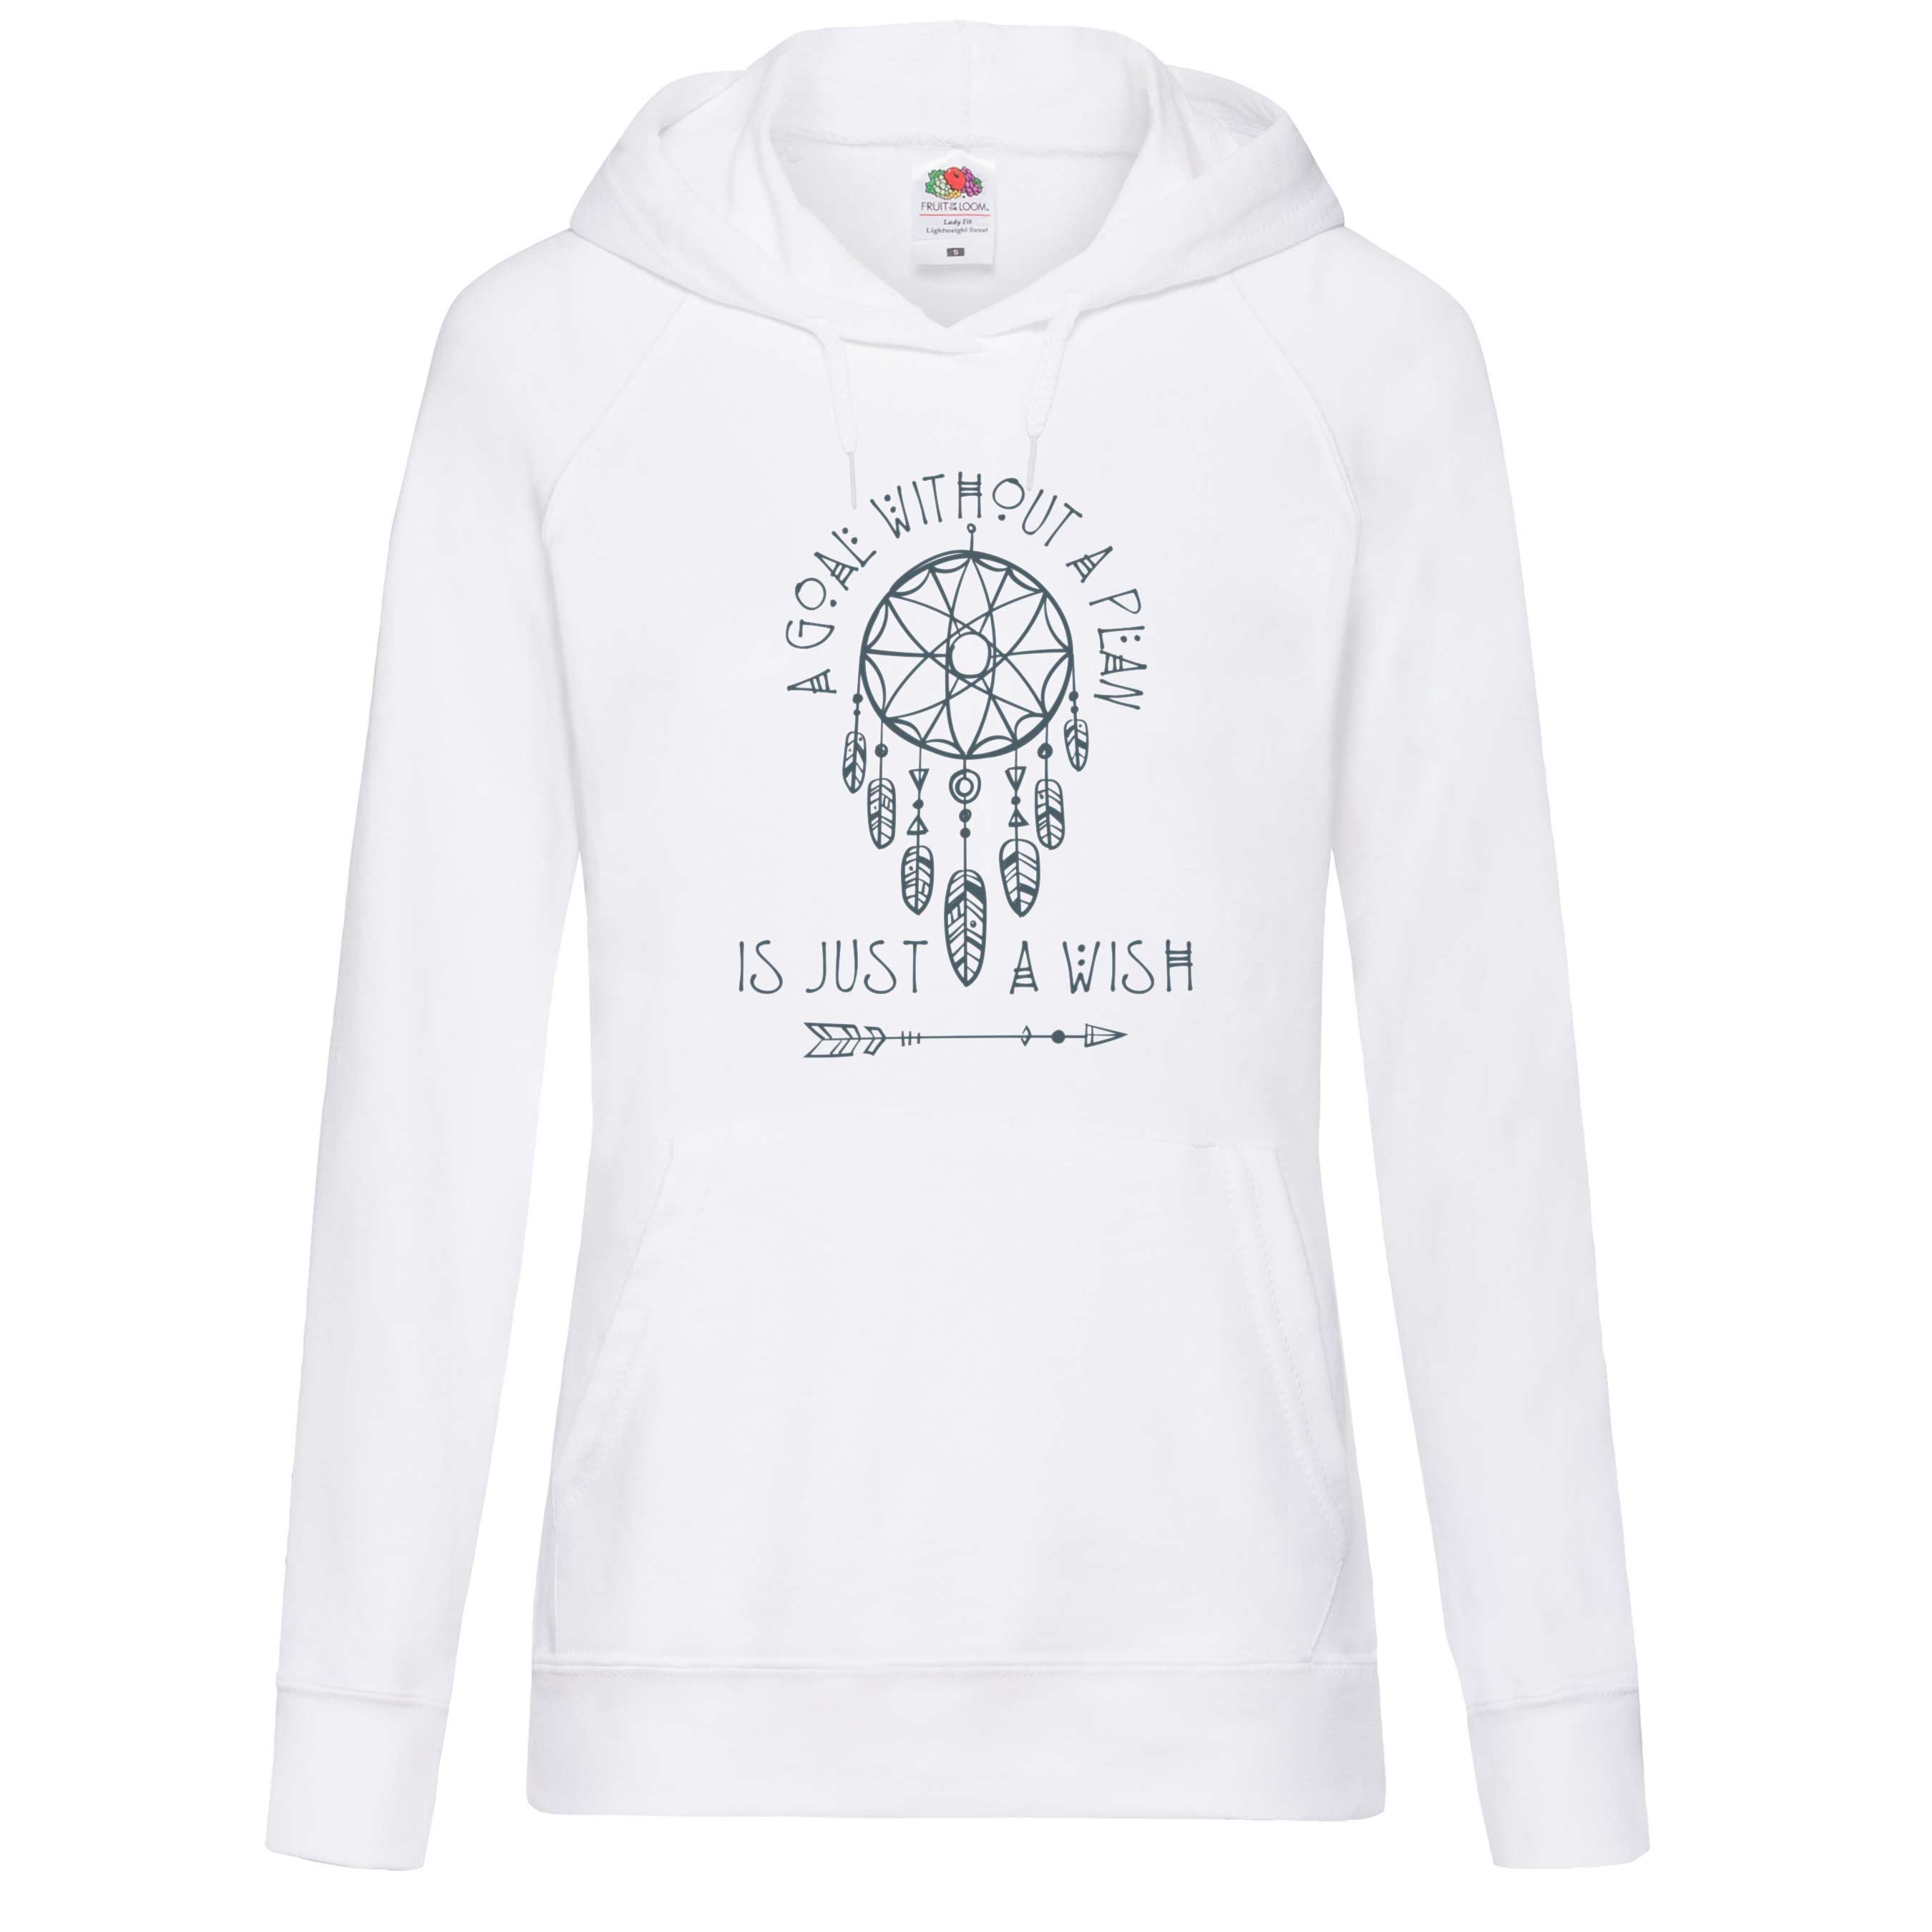 A Goal design for t-shirt, hoodie & sweatshirt